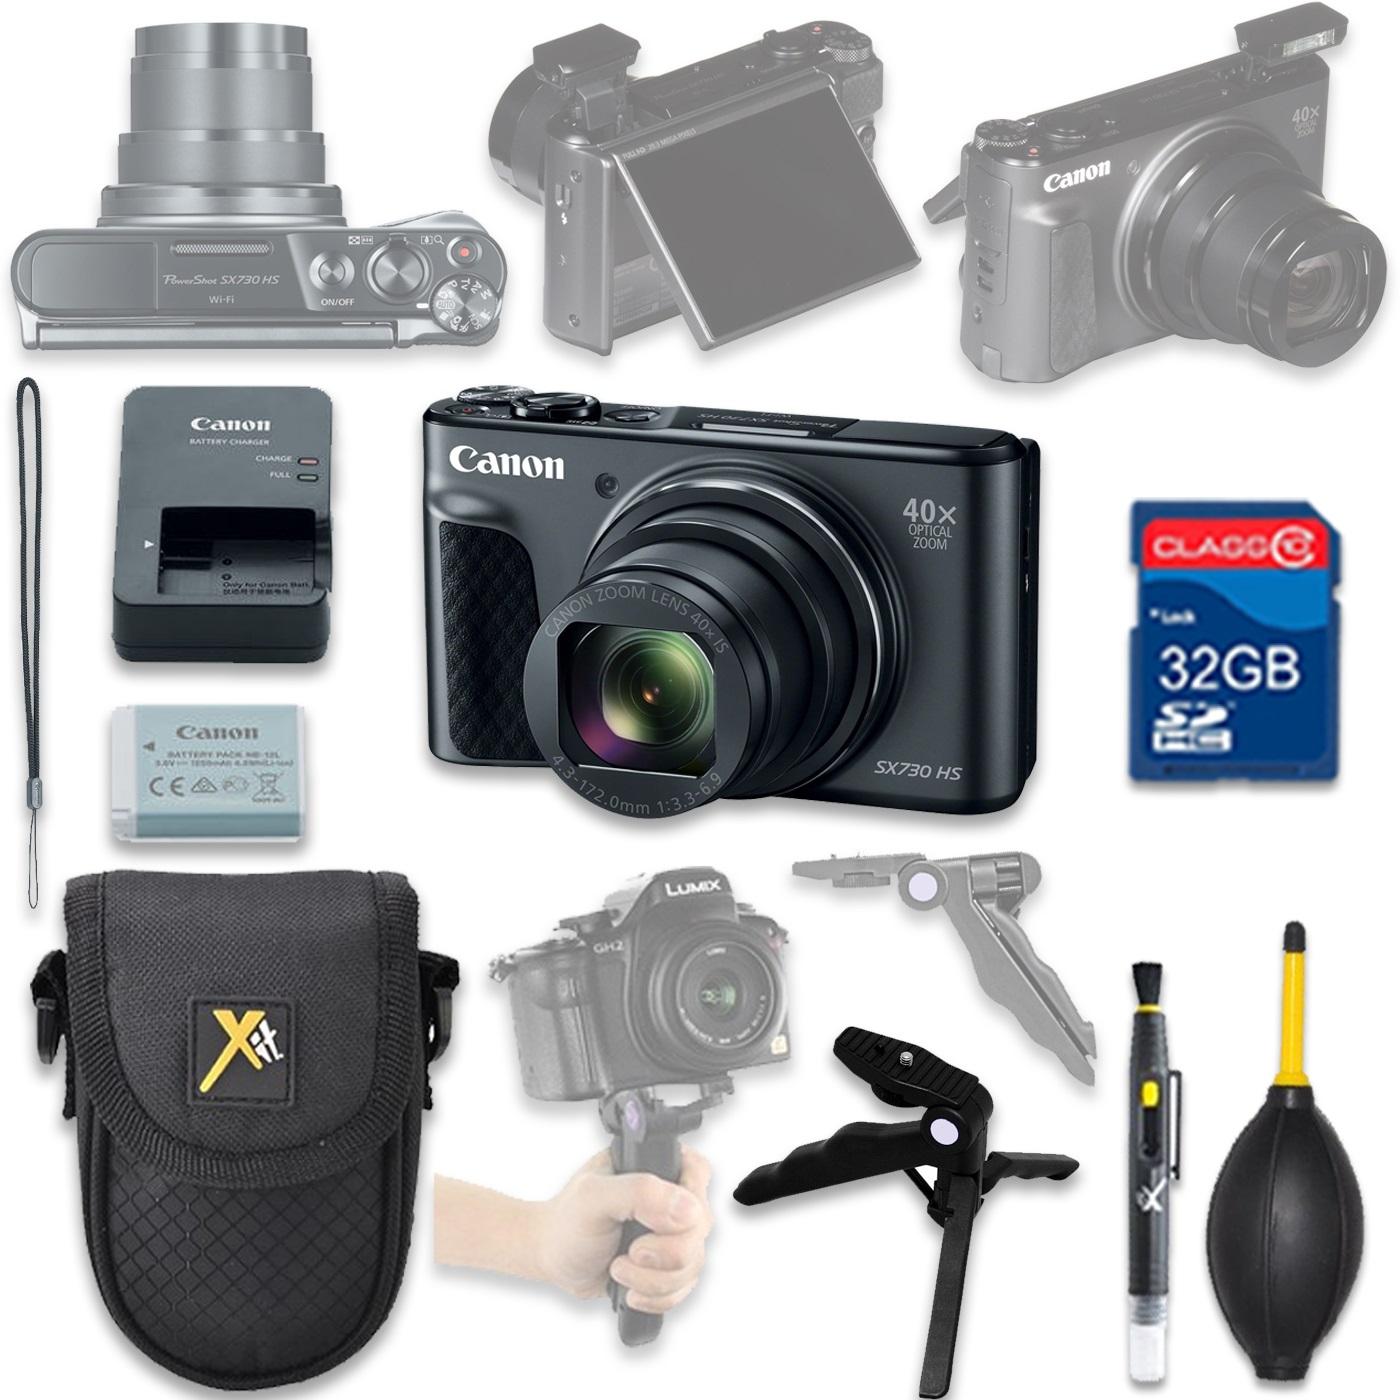 Canon PowerShot SX730 HS Digital Camera(black) with 32GB SD Memory Card + Accessory Bundle